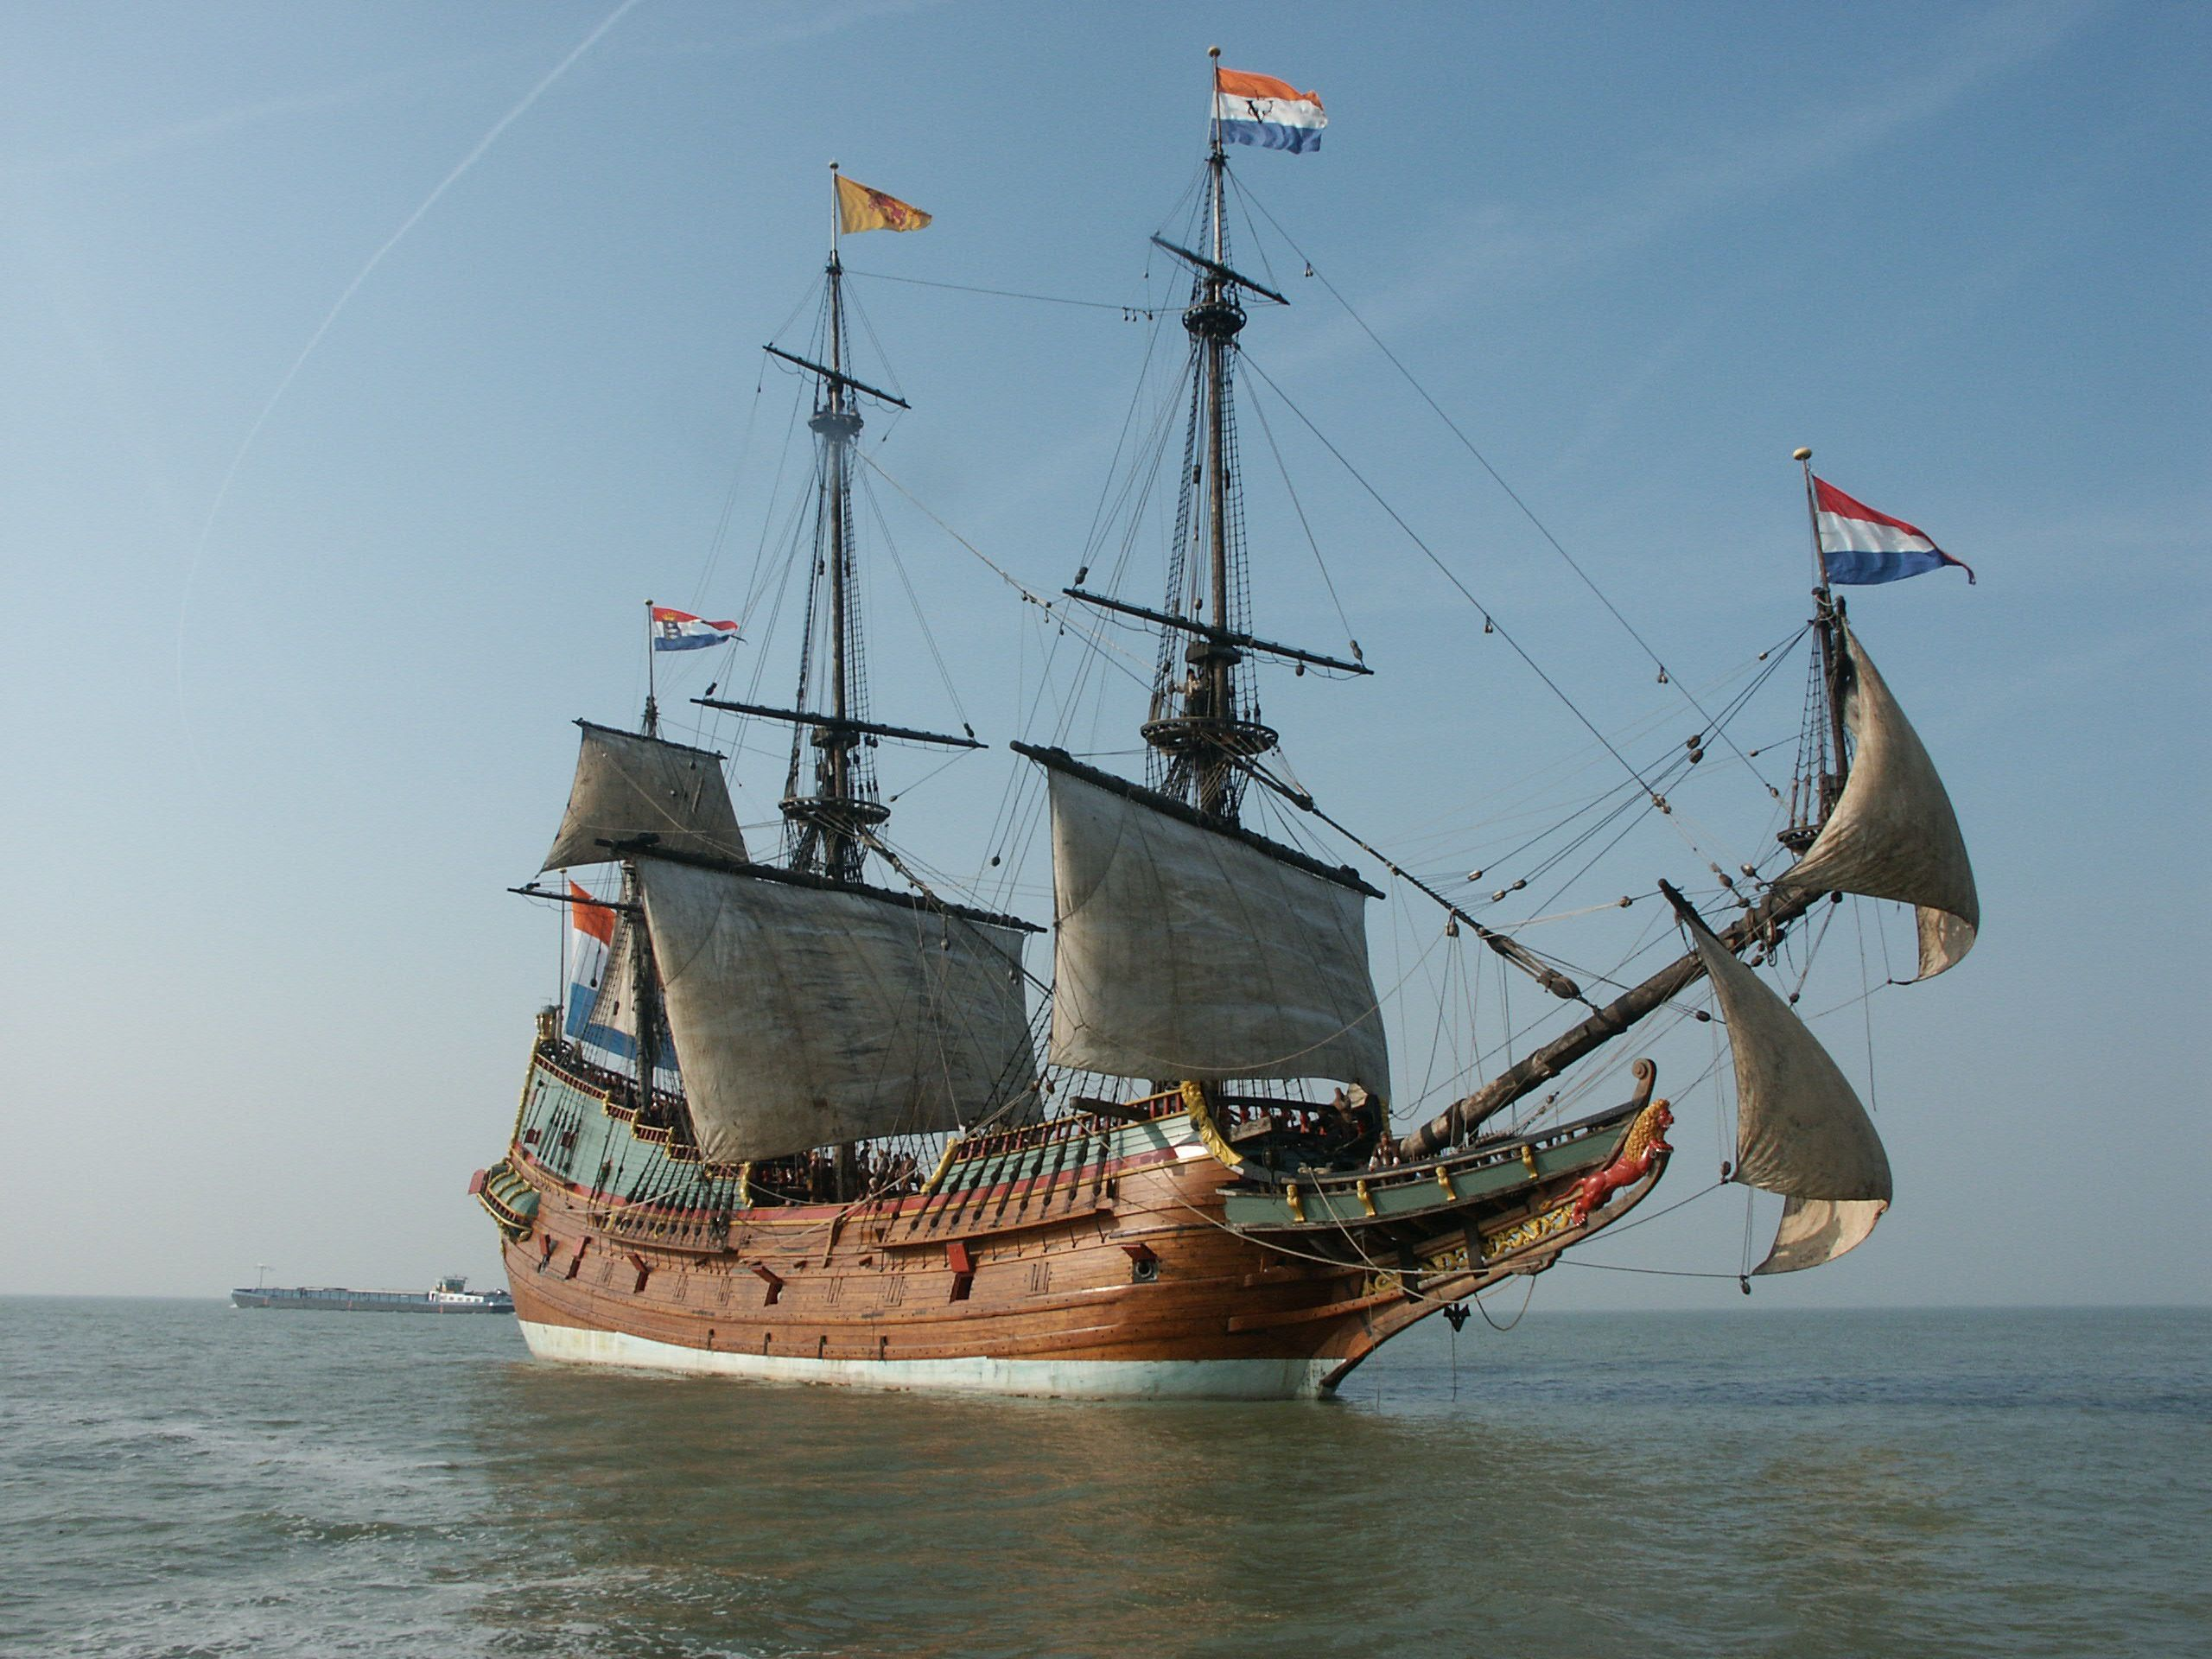 Replica Of The Batavia An Early 17th Century Dutch East India